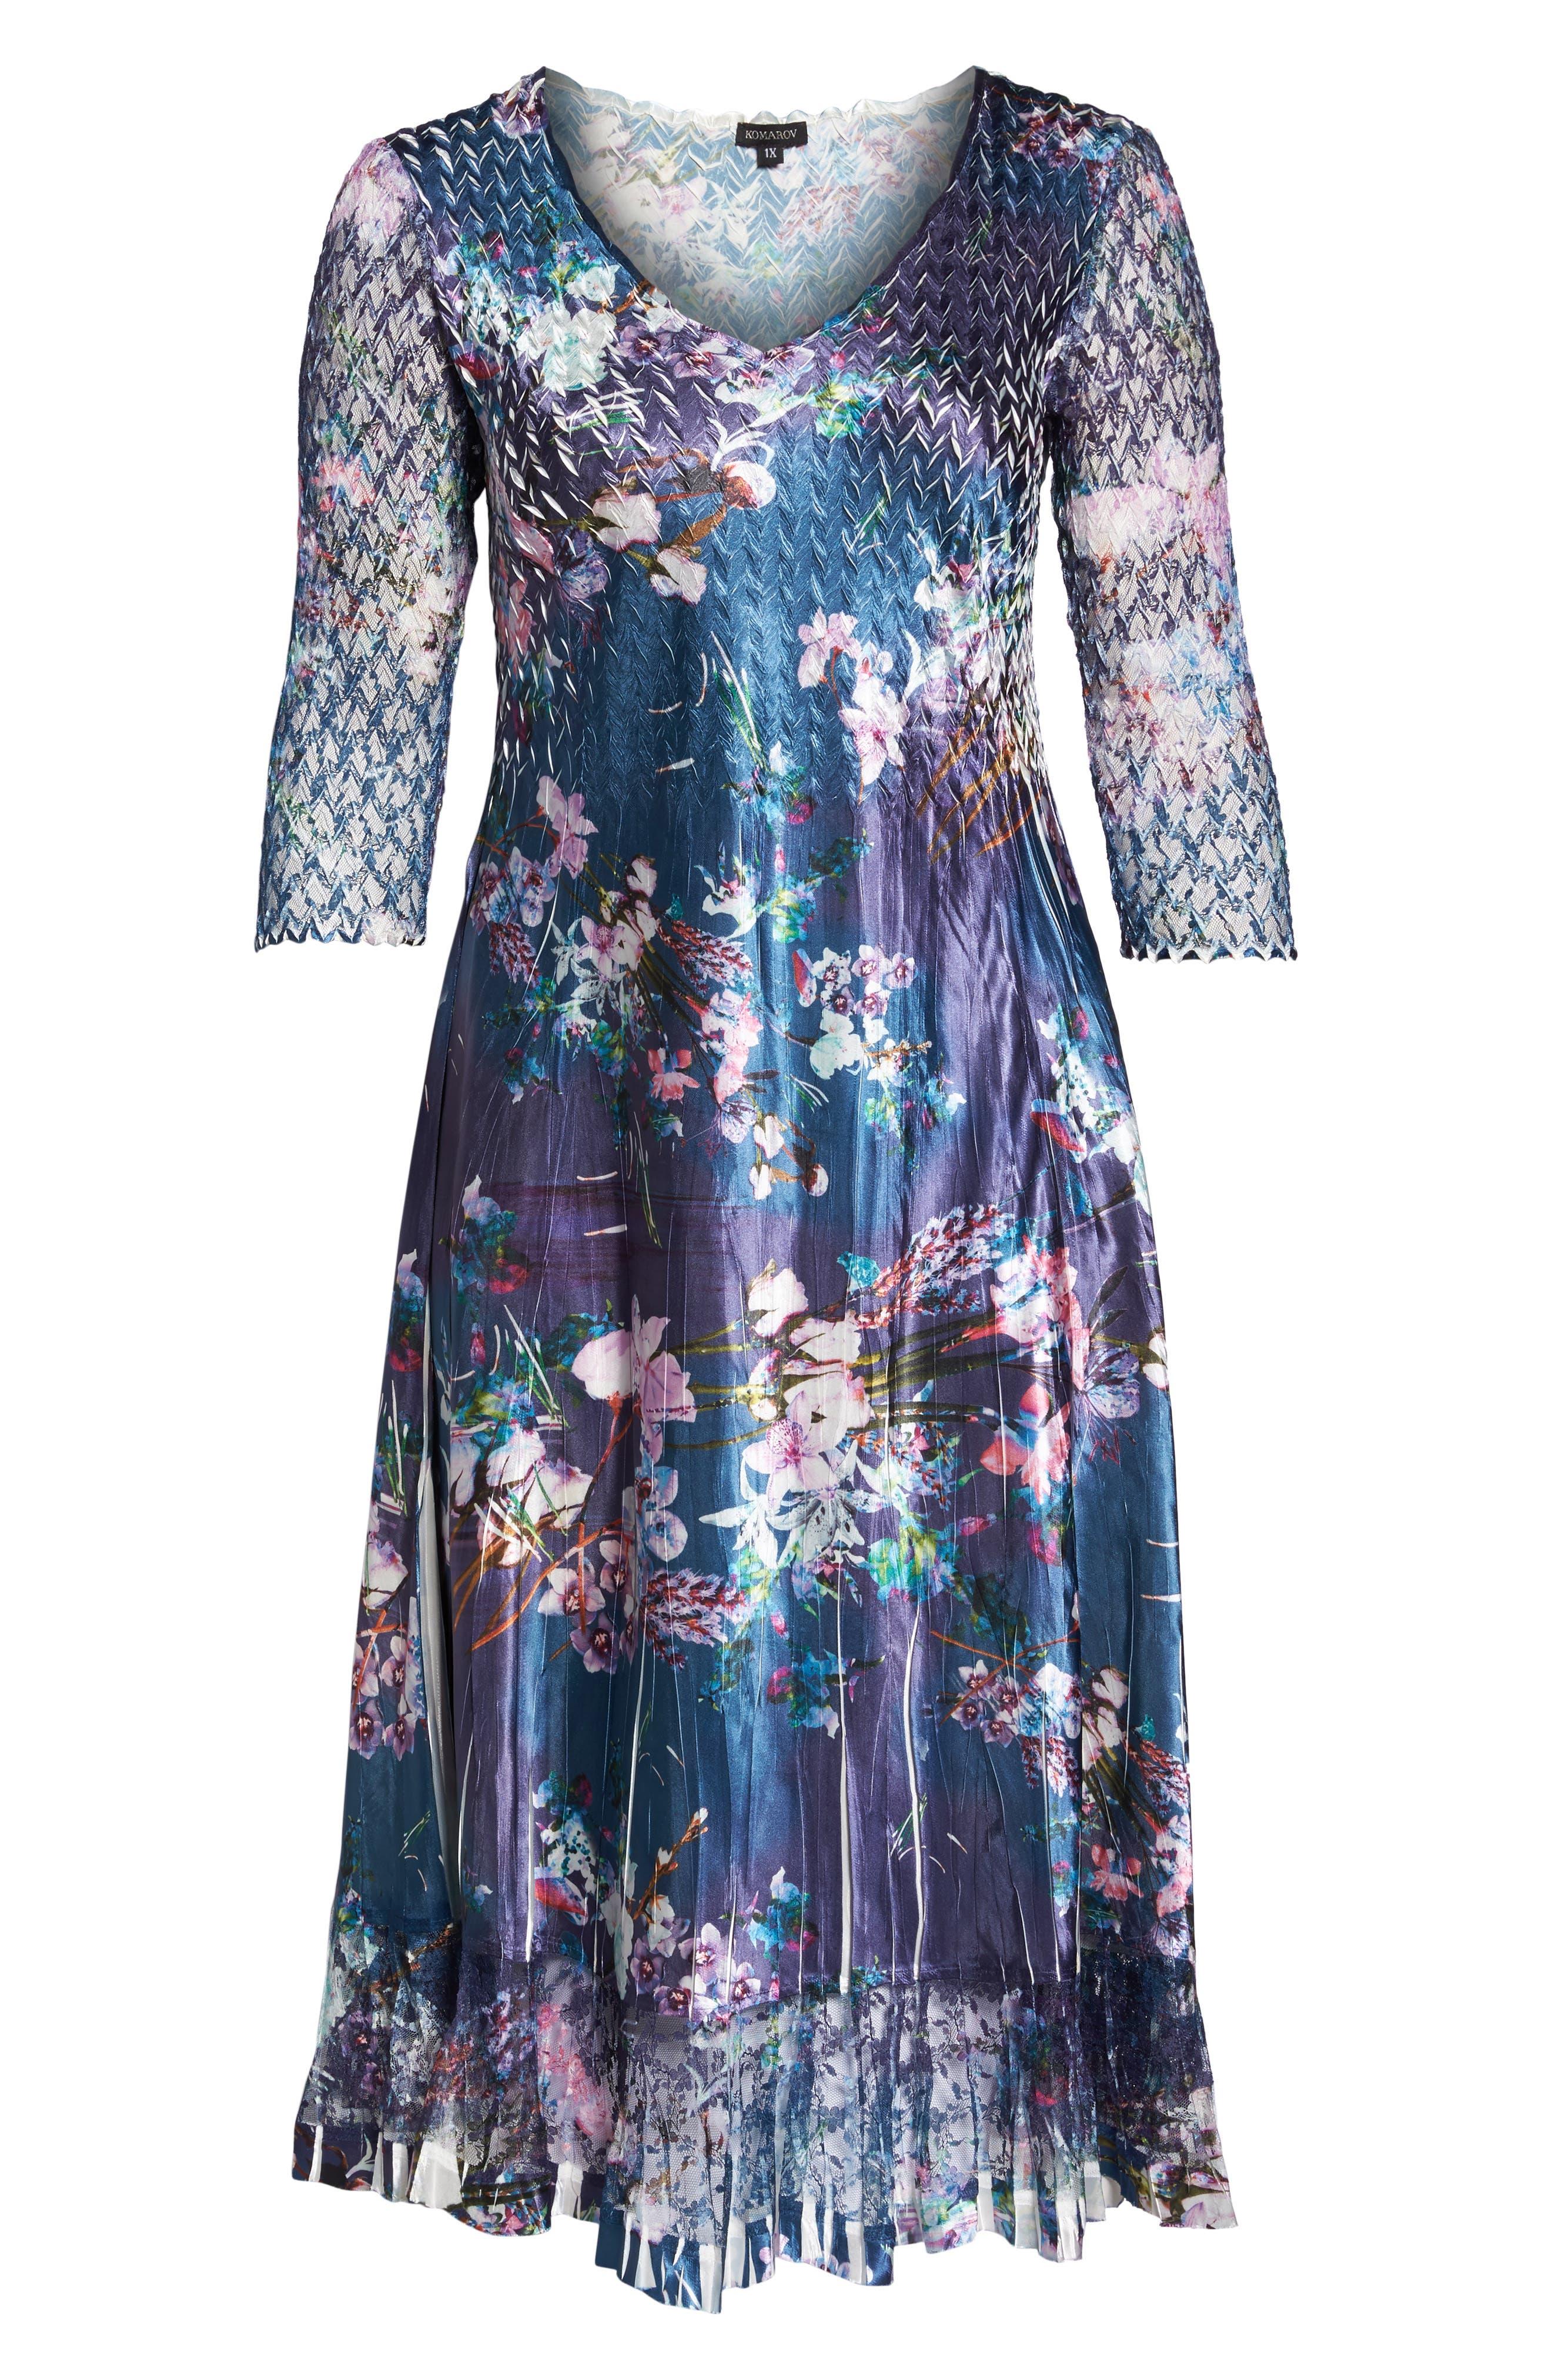 Kamarov Floral Charmeuse & Chiffon Dress,                             Alternate thumbnail 5, color,                             Pixel Meadow